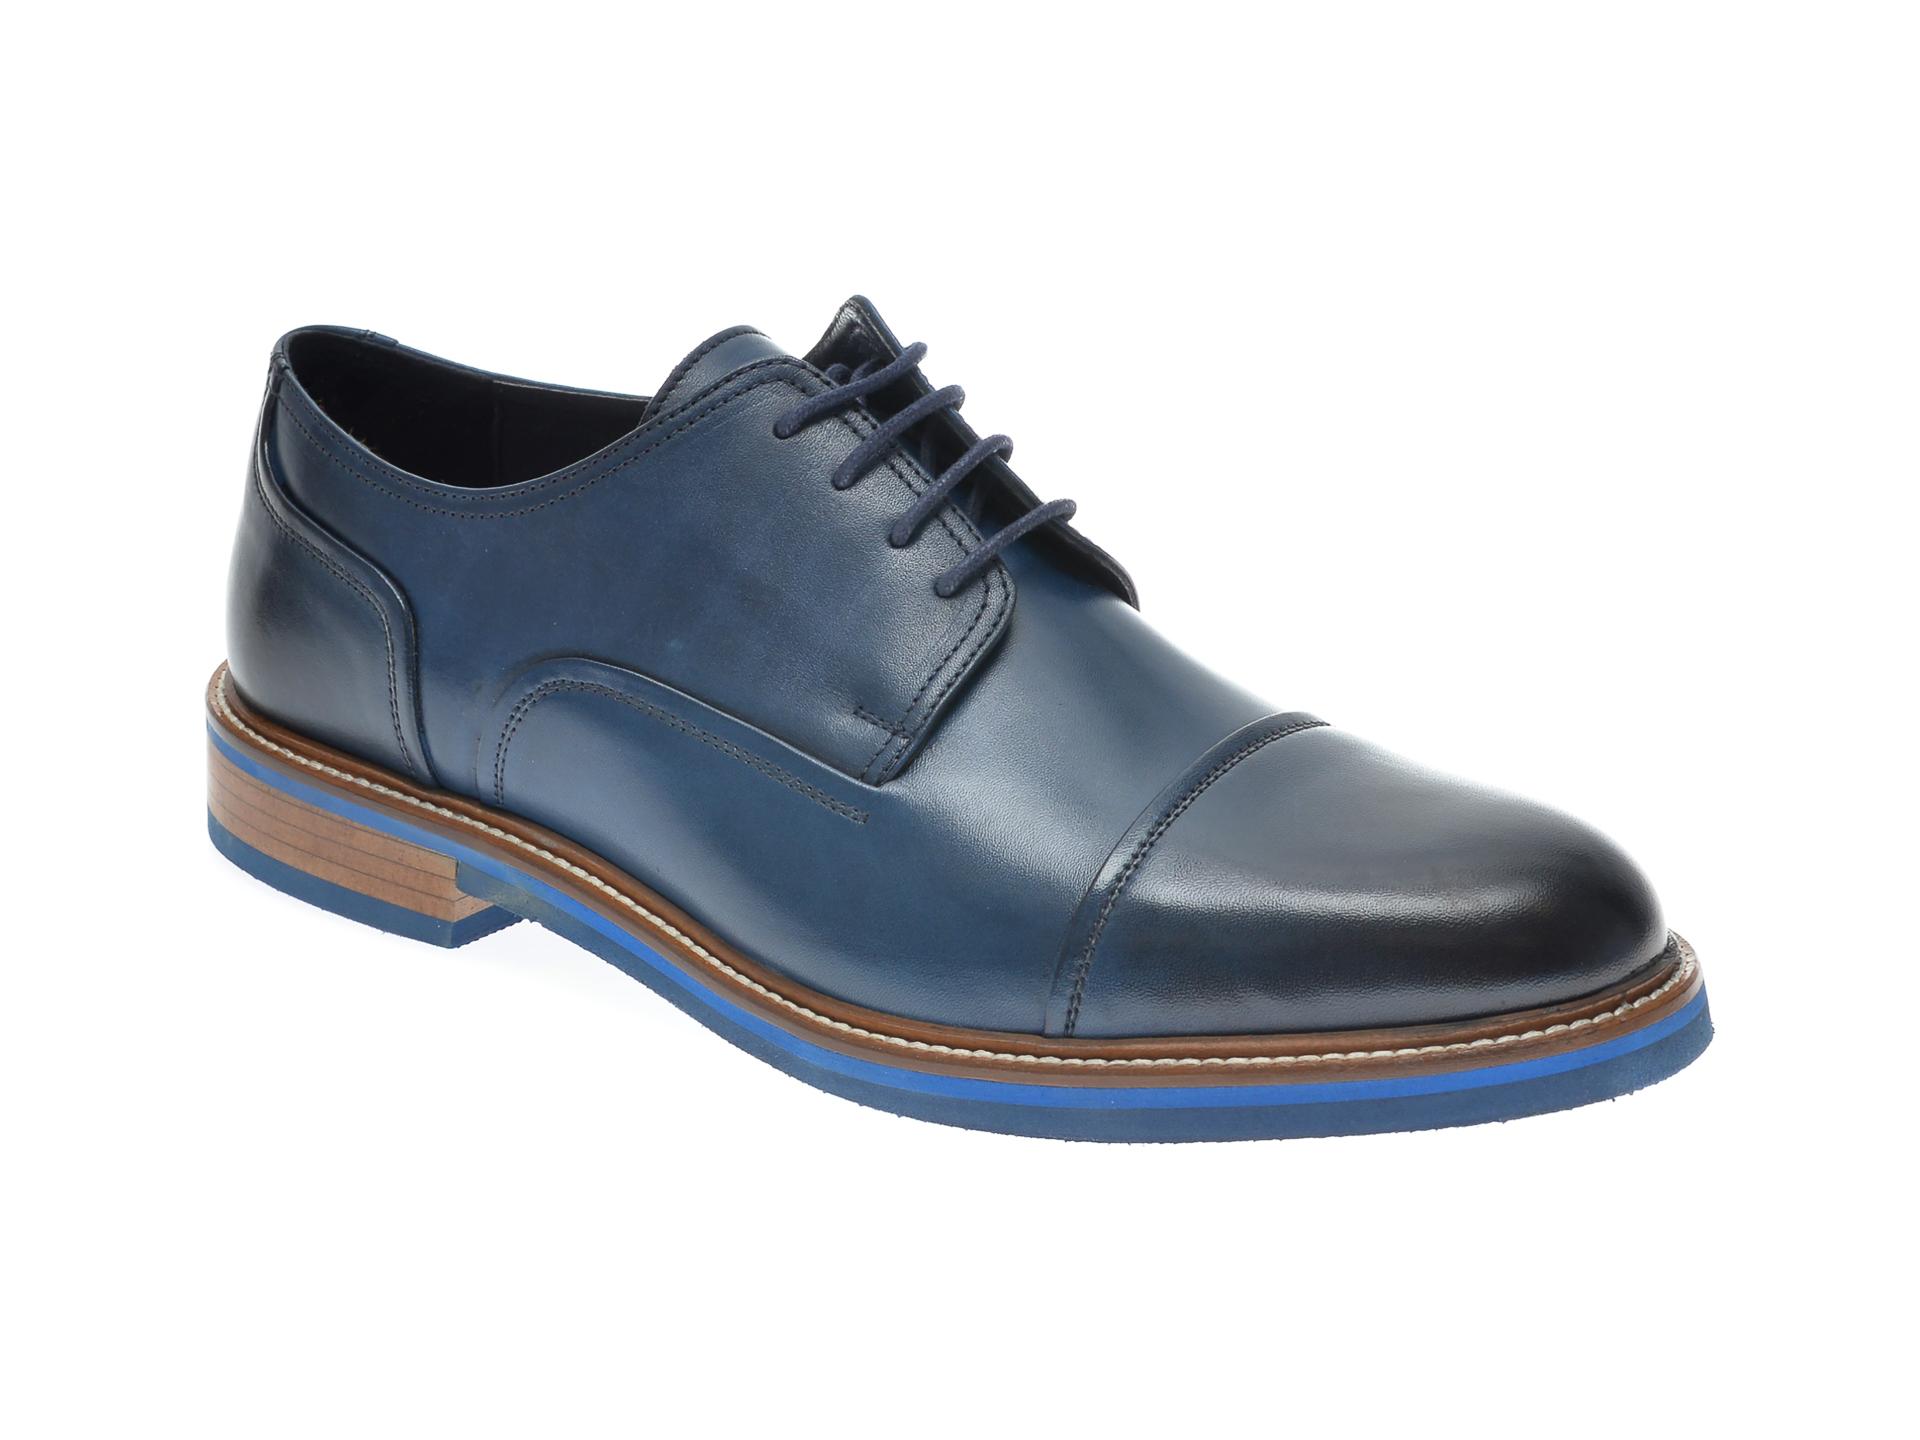 Pantofi OTTER bleumarin, 7843, din piele naturala imagine